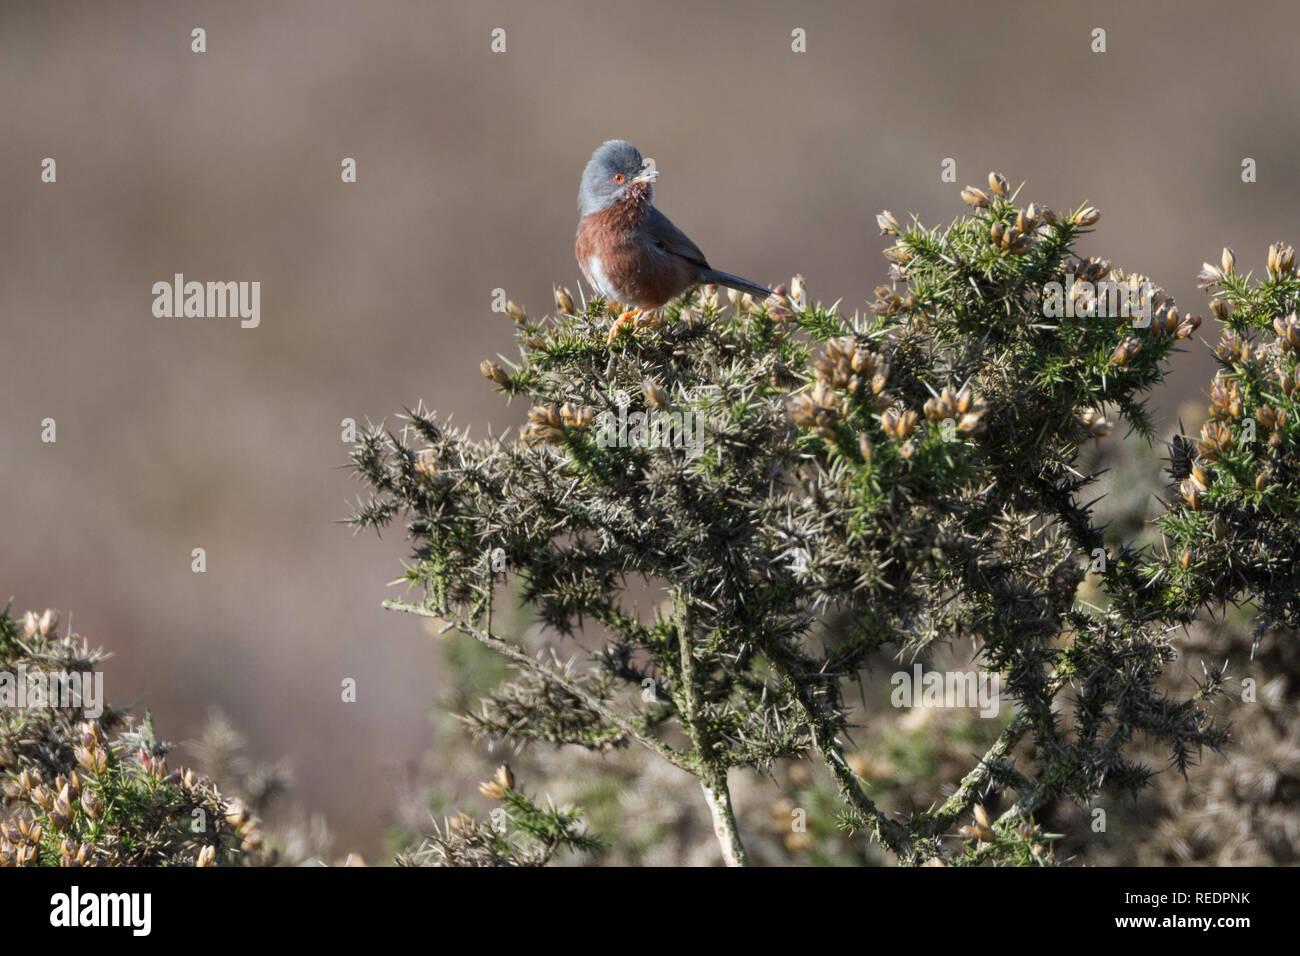 Dartford warbler (Sylvia undata) perched on vegetation on heathland in Wales. Stock Photo